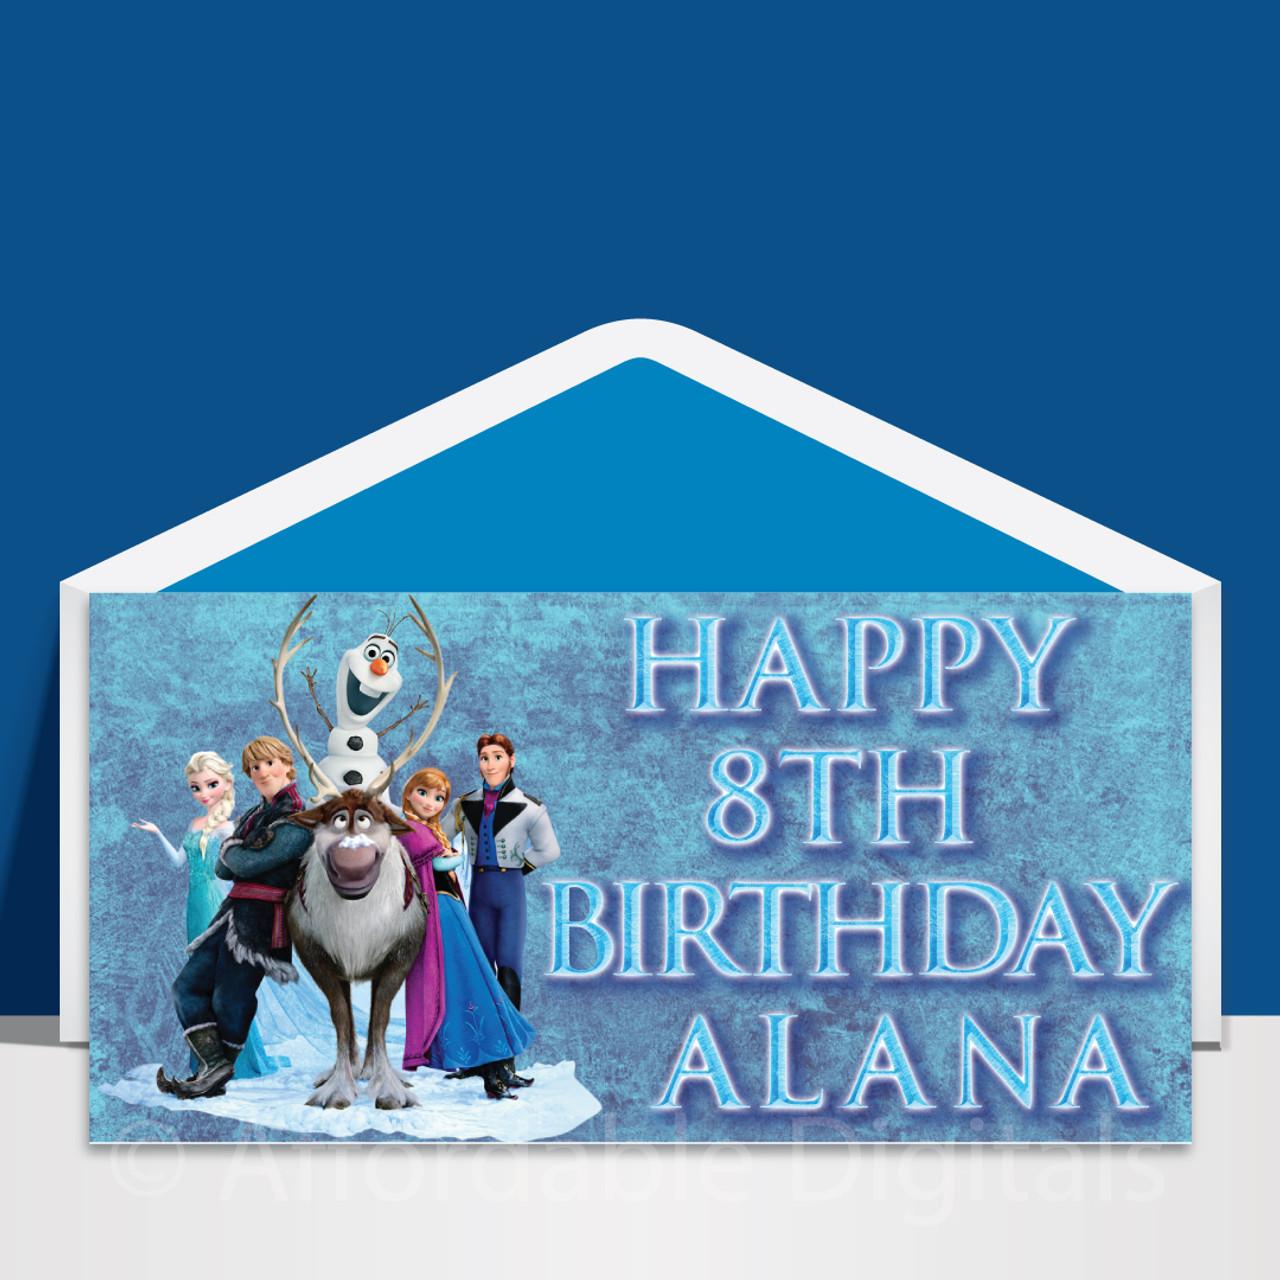 Enjoyable Frozen Personalised Dl Birthday Card Design 10002 Affordable Birthday Cards Printable Benkemecafe Filternl